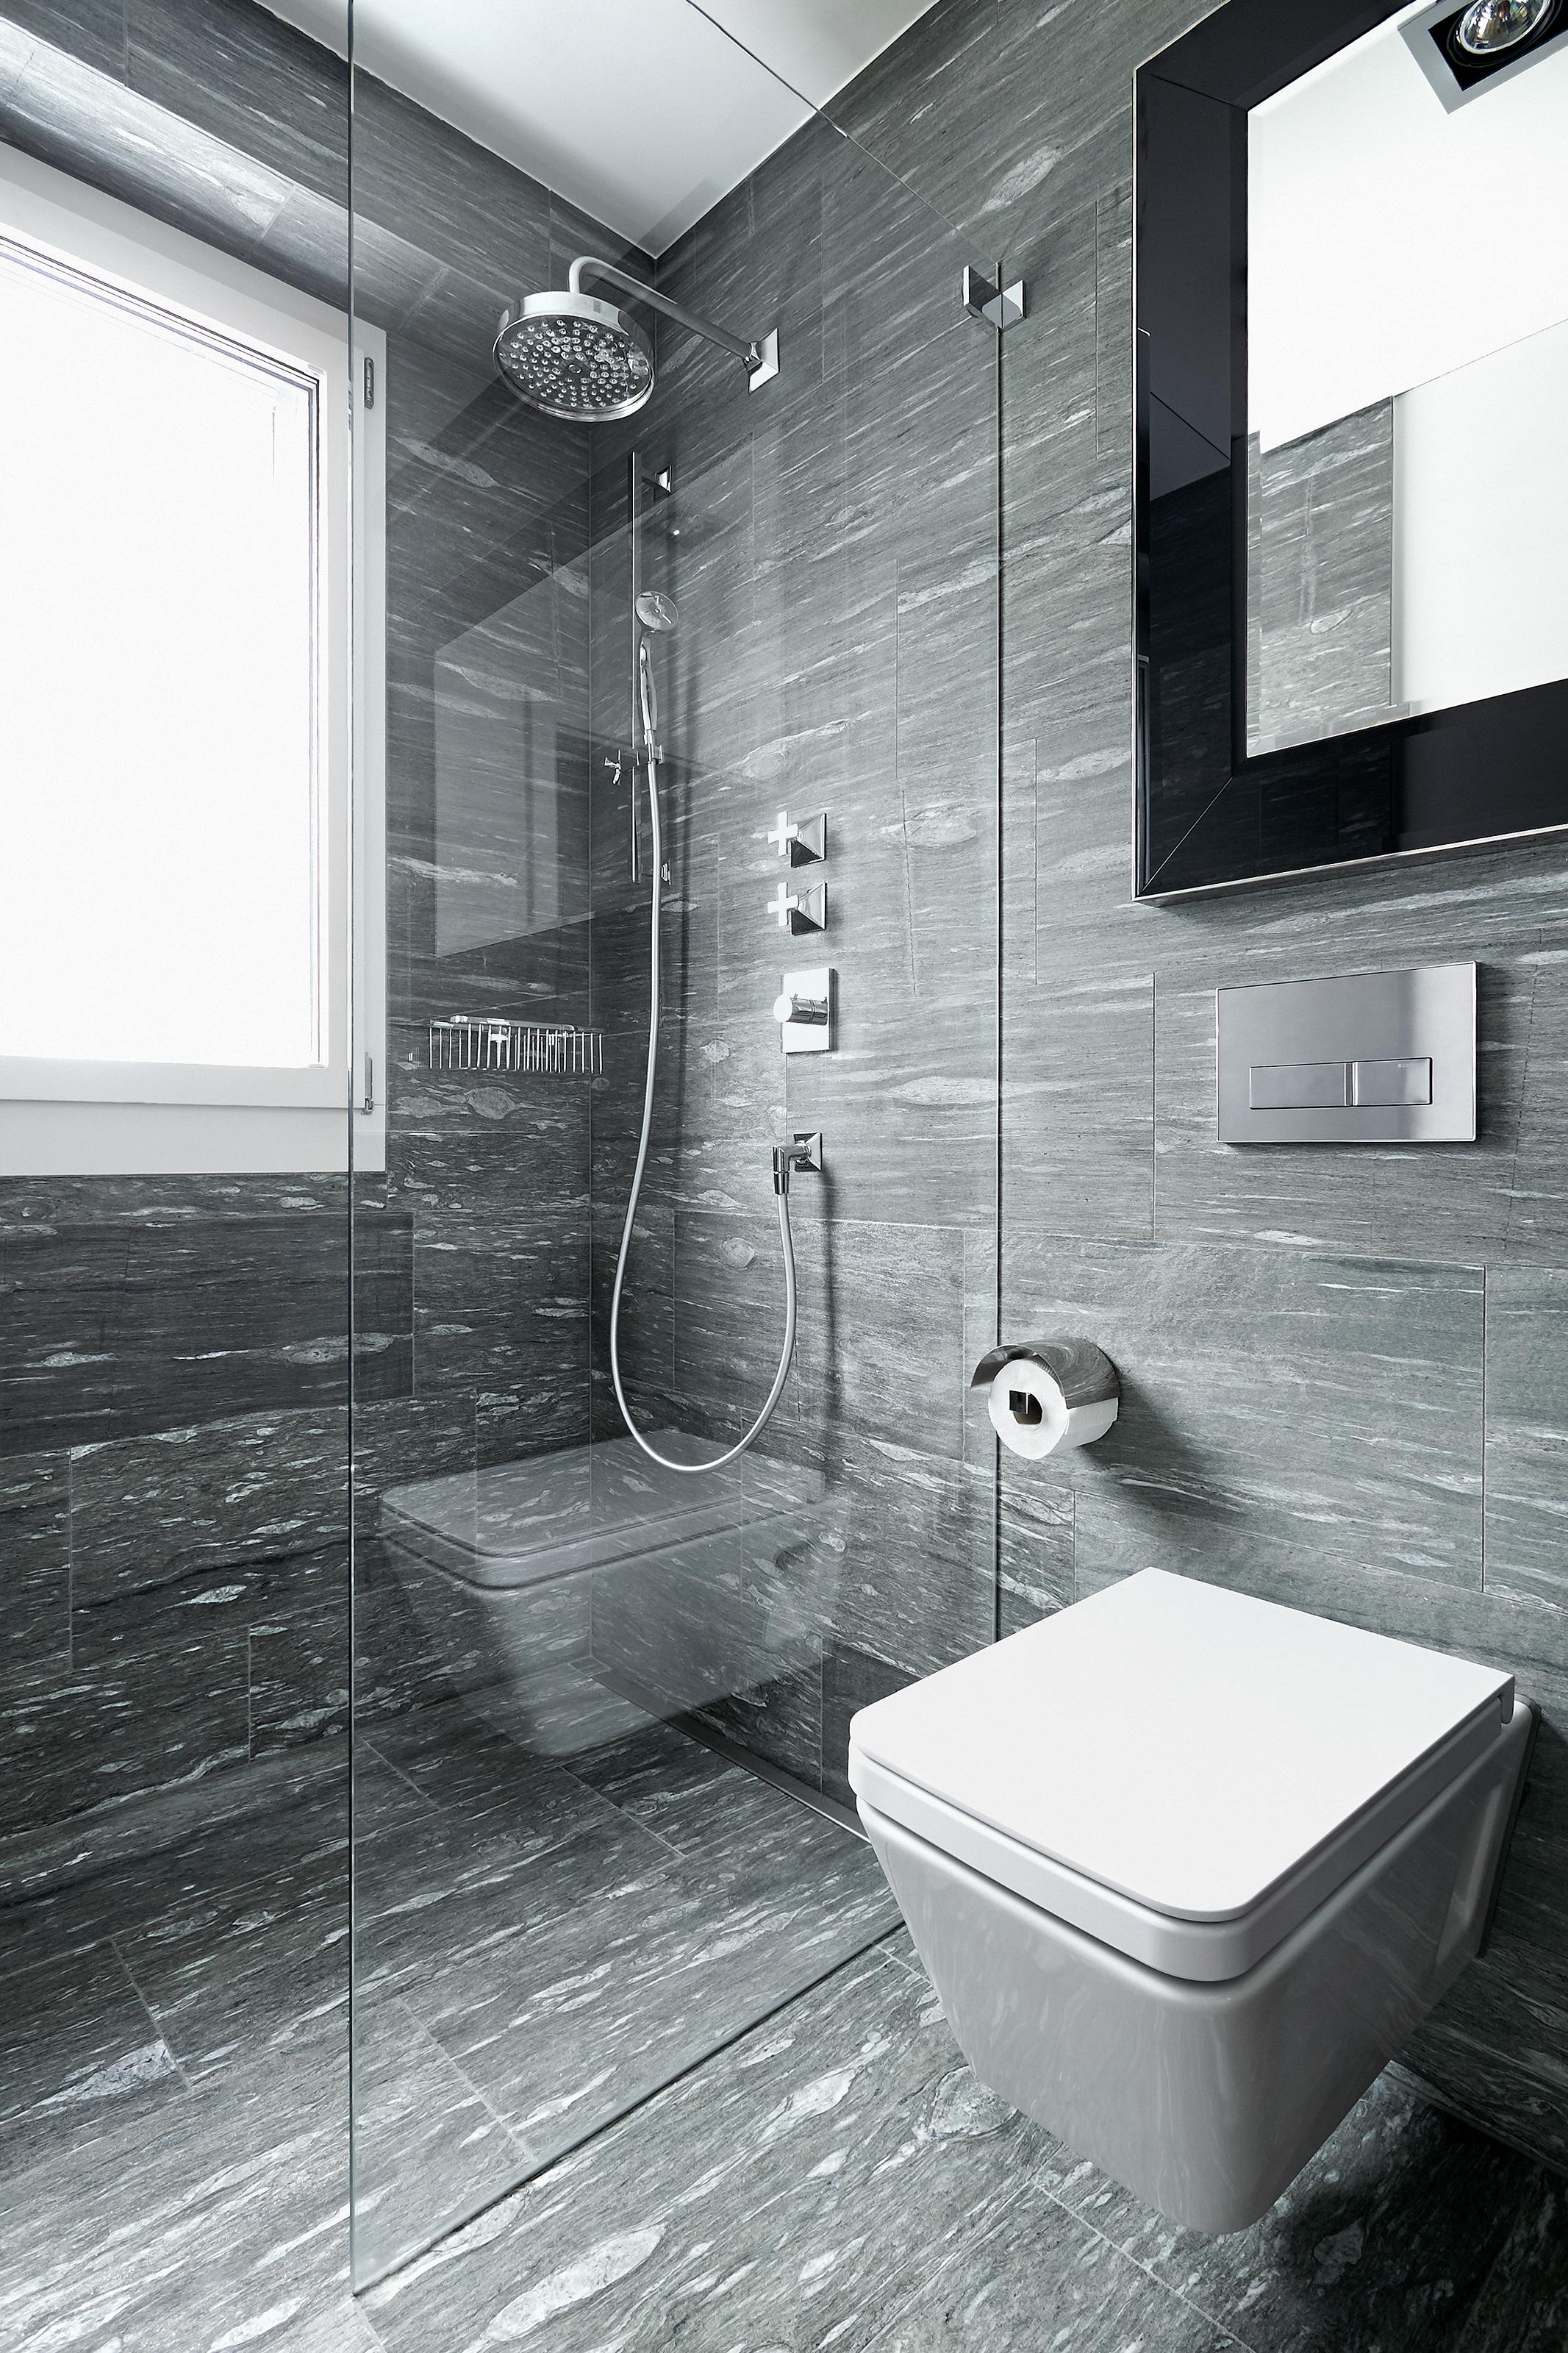 dusche mit valser quarzit verlegt kewabo senn. Black Bedroom Furniture Sets. Home Design Ideas